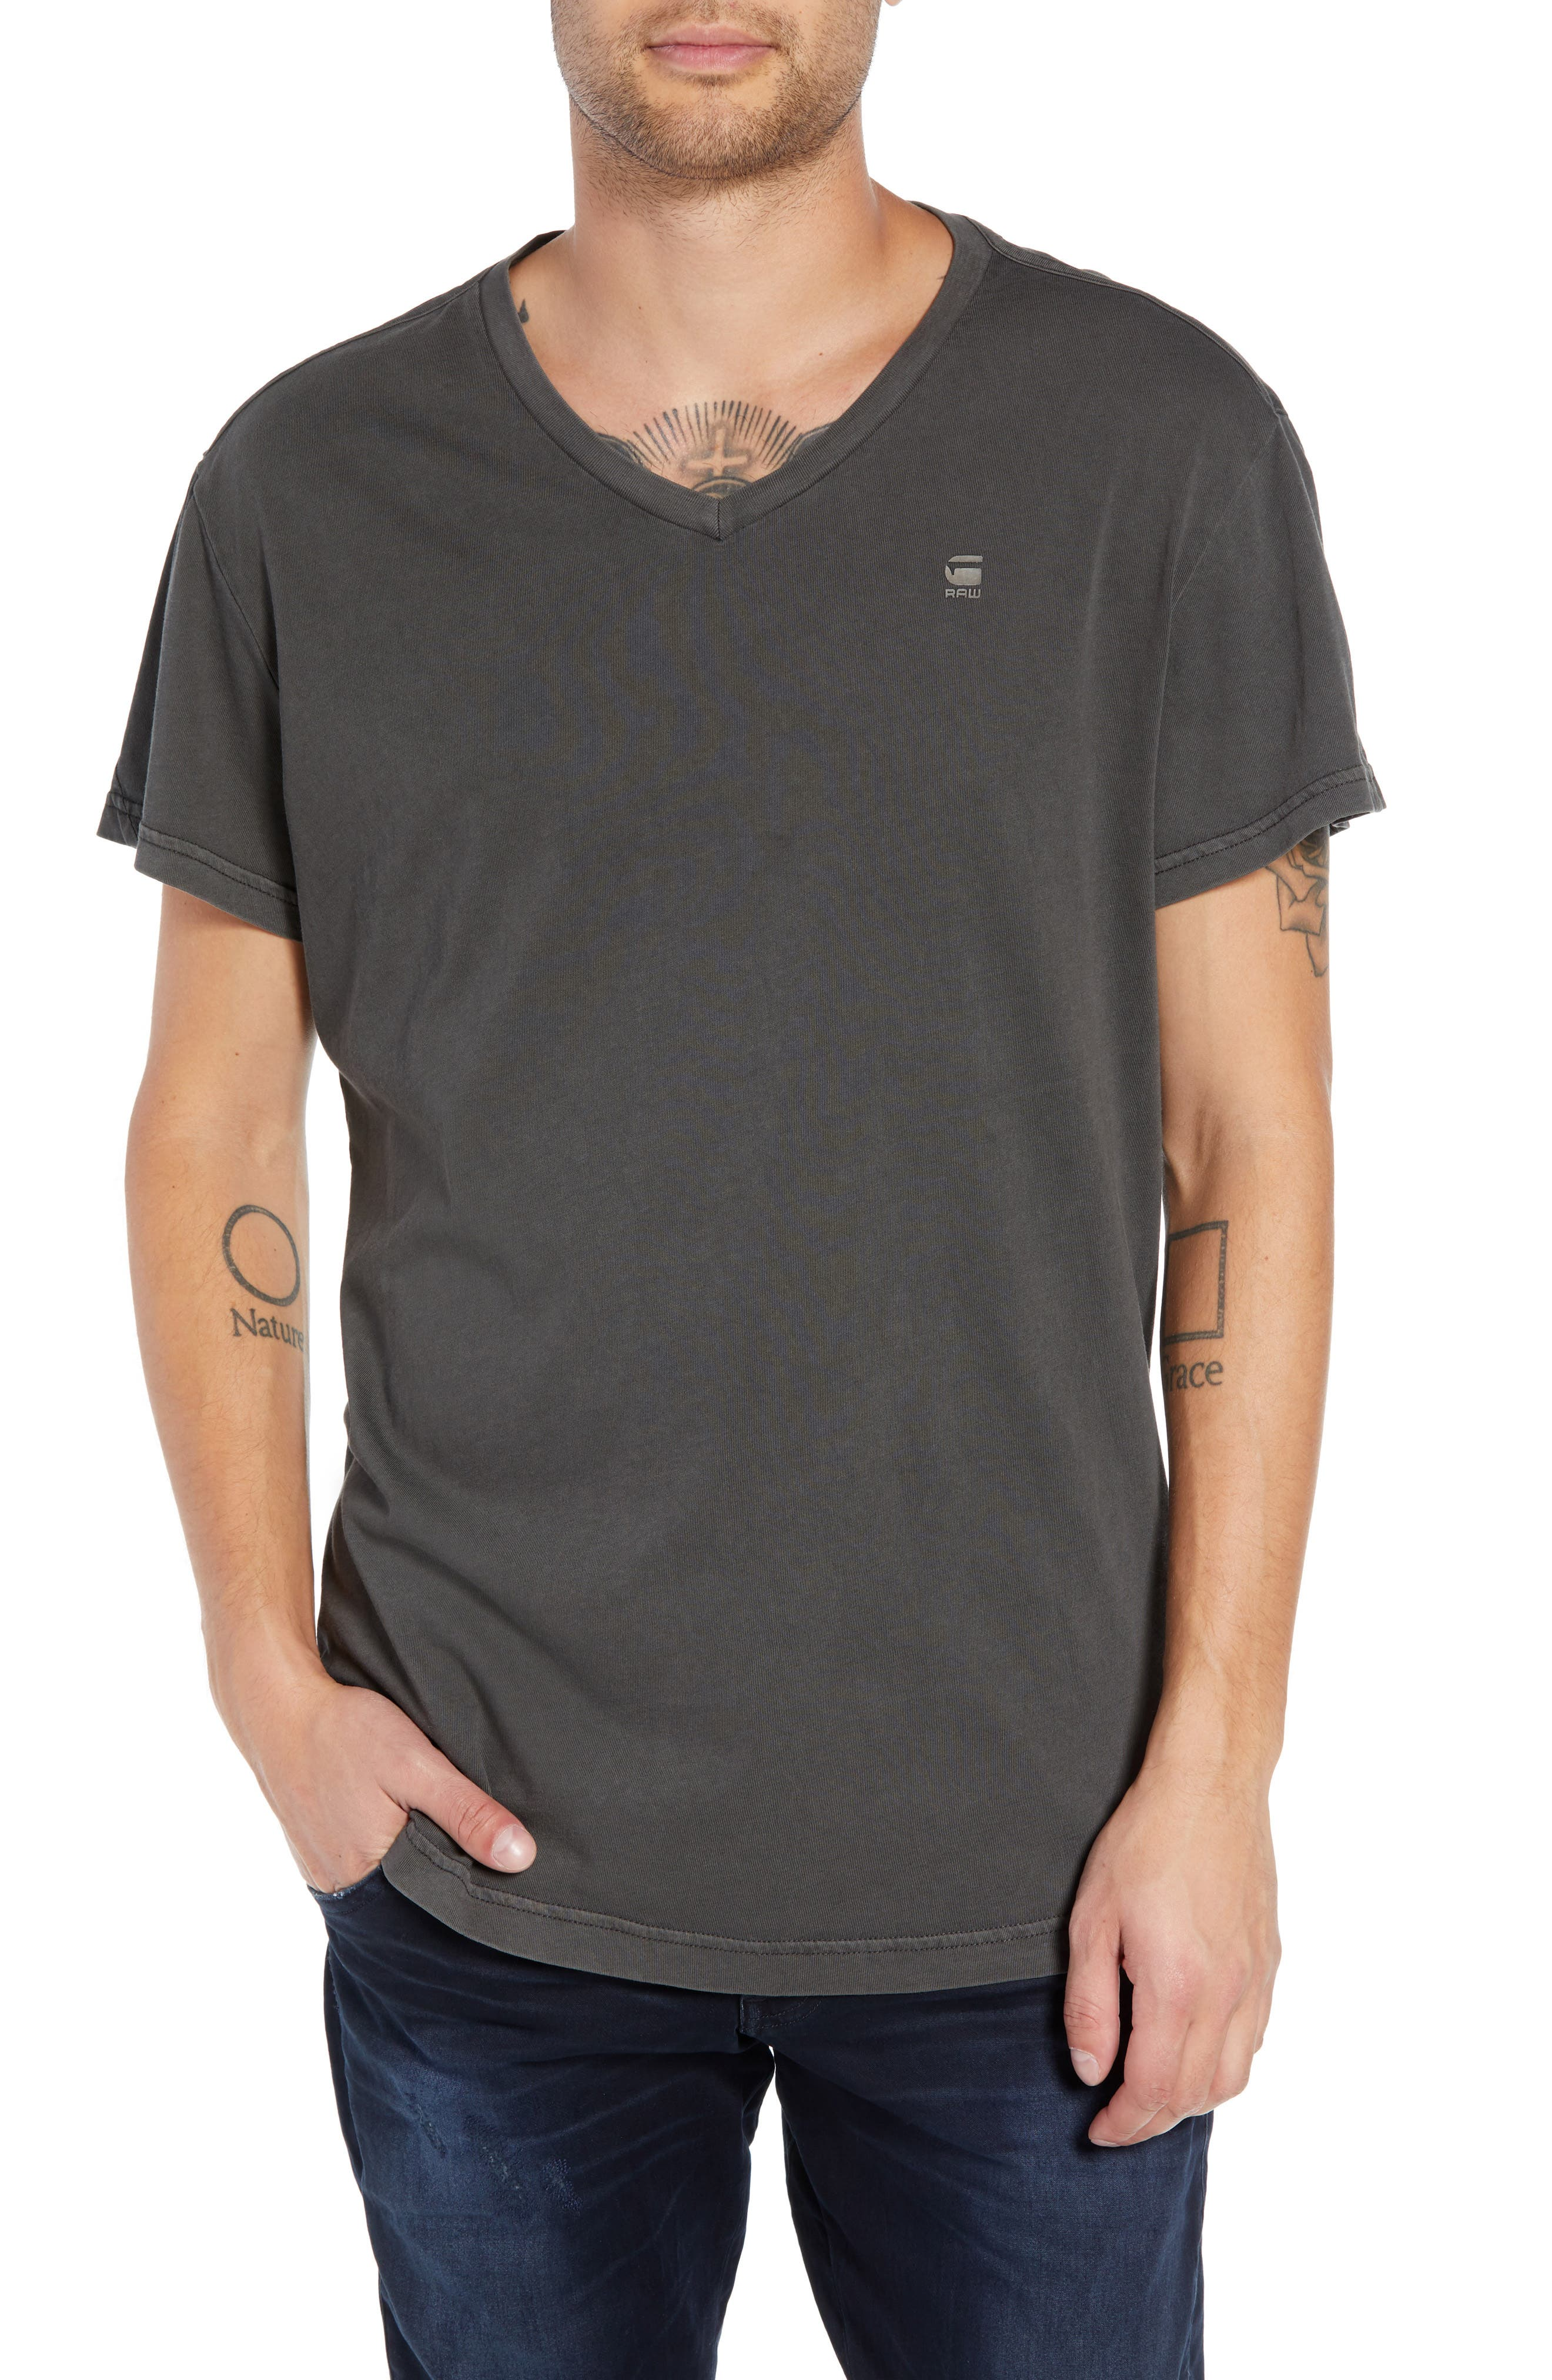 G-STAR RAW Starkton Solid V-Neck T-Shirt in Dark Black